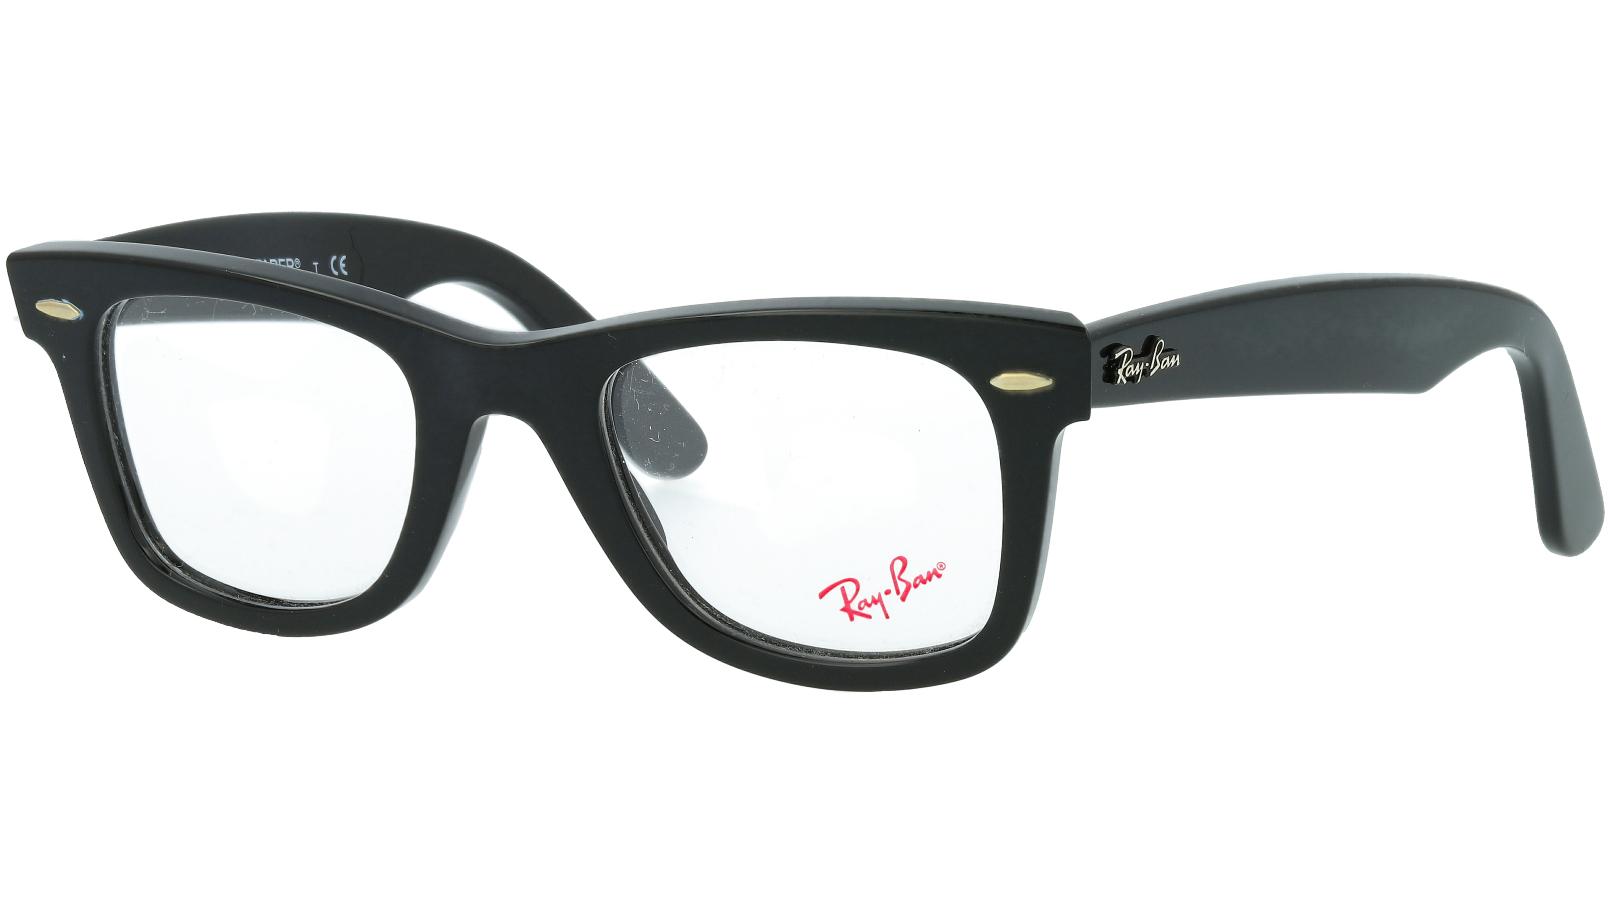 Ray-Ban RB5121 2000 47 BLACK Glasses